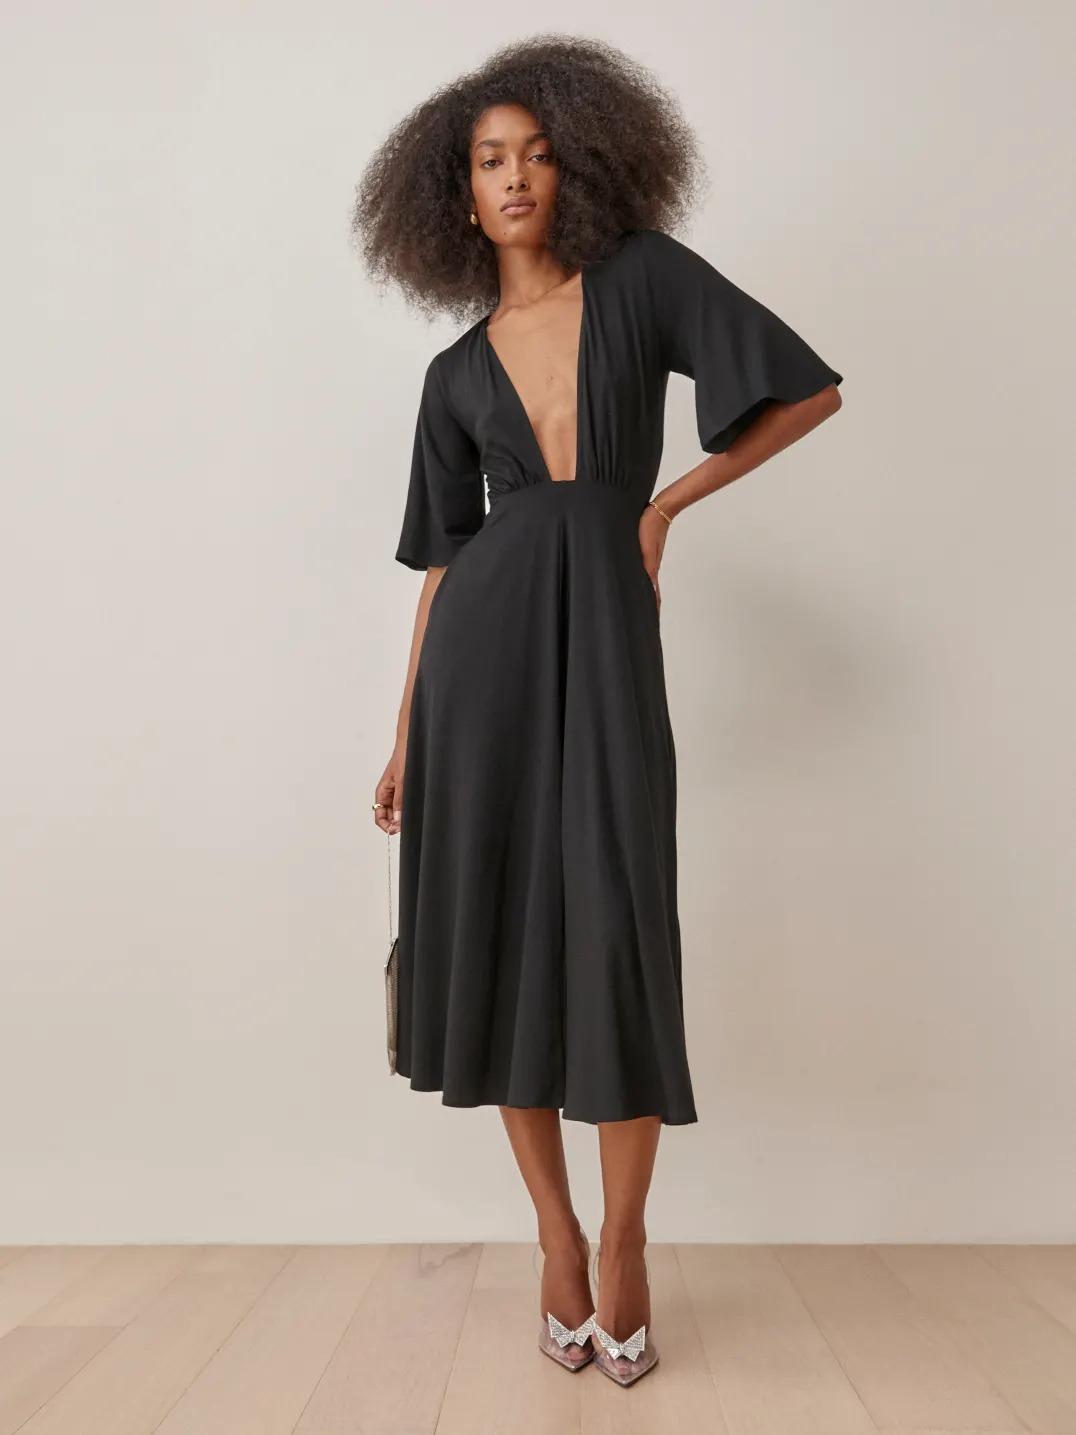 short sleeved plunging neckline short black wedding dress from the Reformation